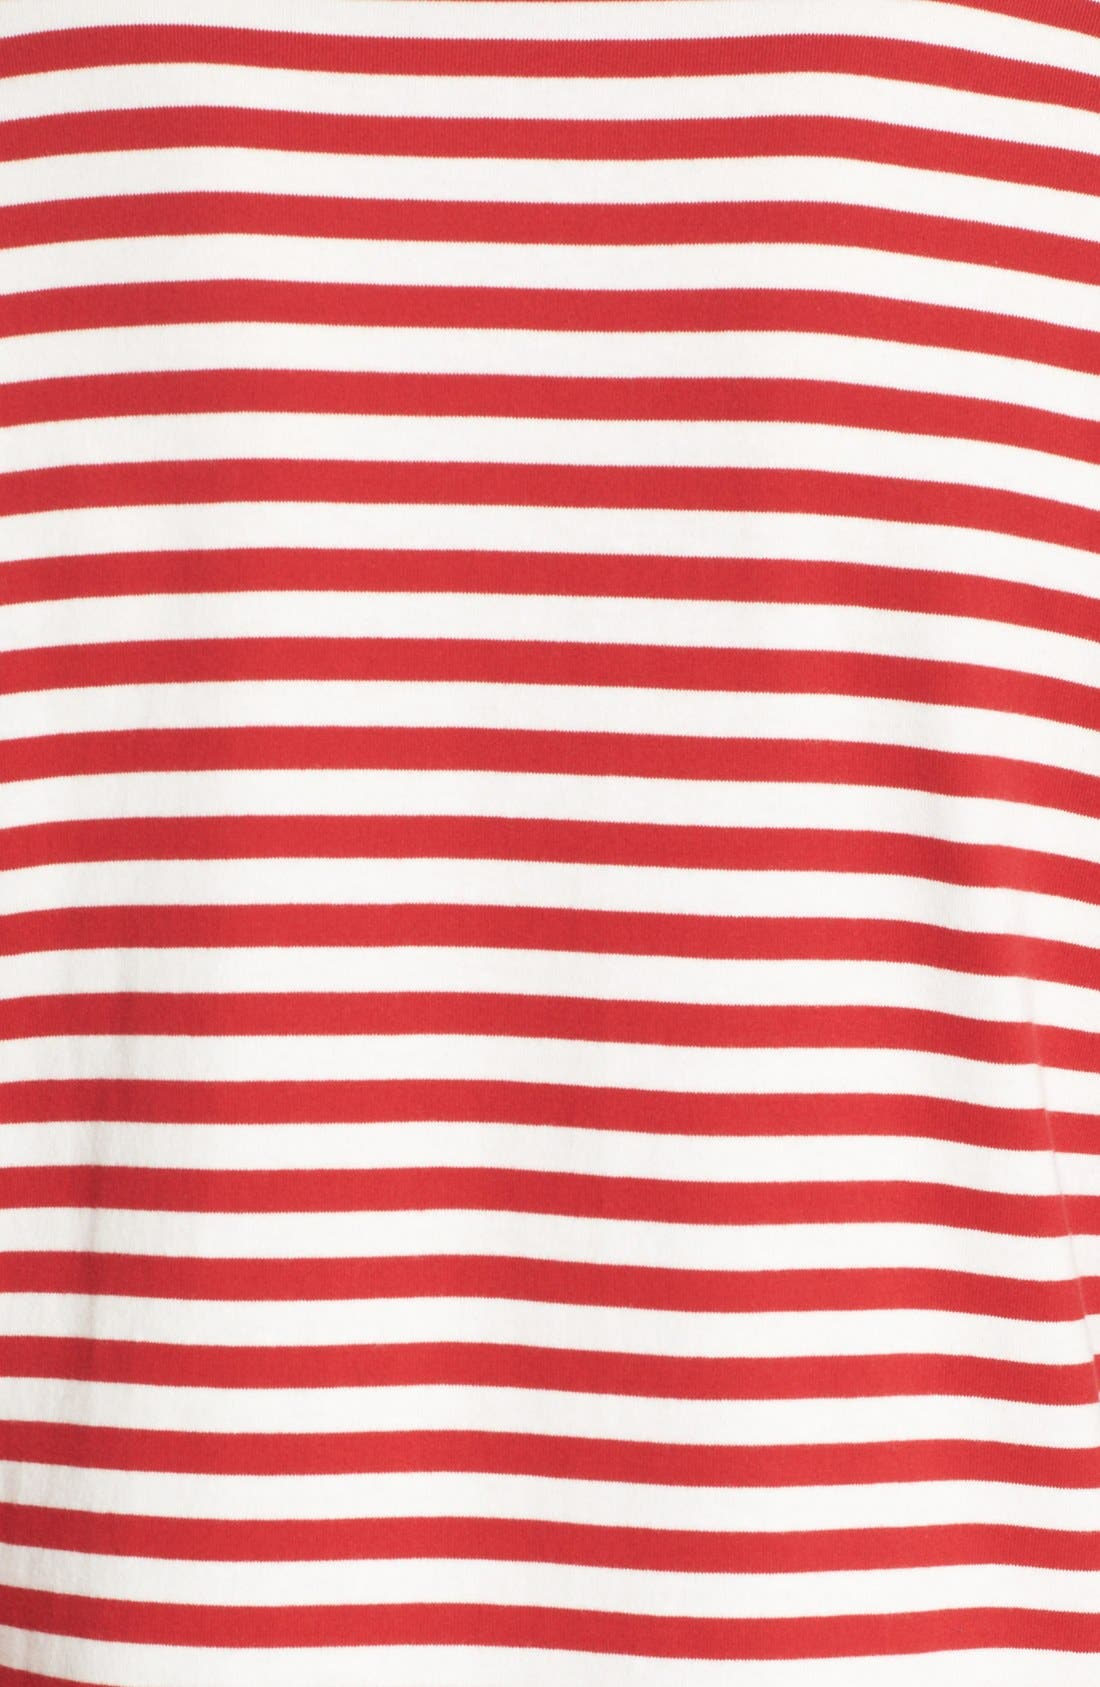 Comme des Garçons PLAY Stripe Long Sleeve T-Shirt,                             Alternate thumbnail 5, color,                             Red/ White